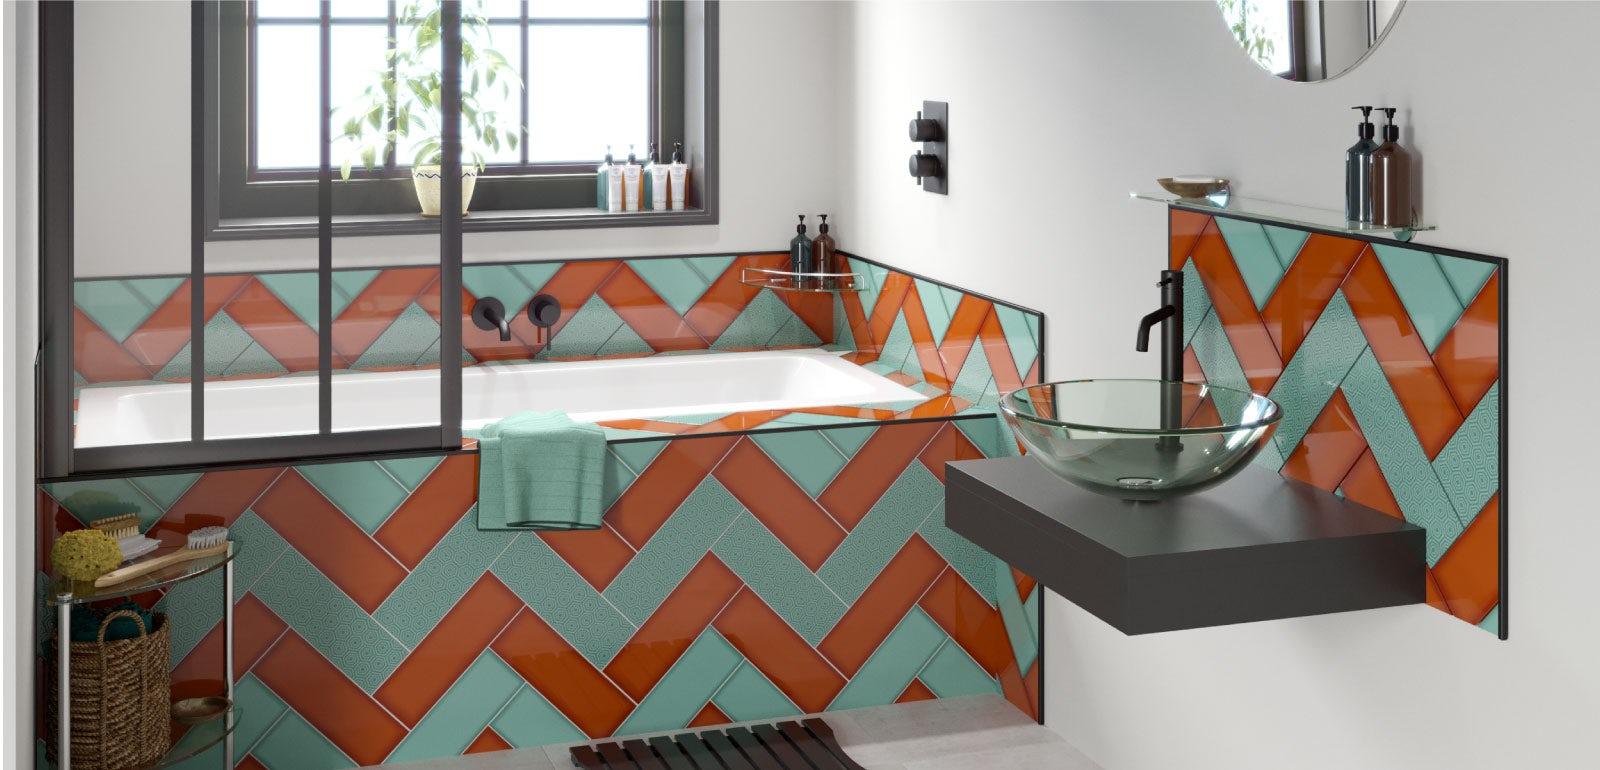 Bathroom Ideas: Maximalism